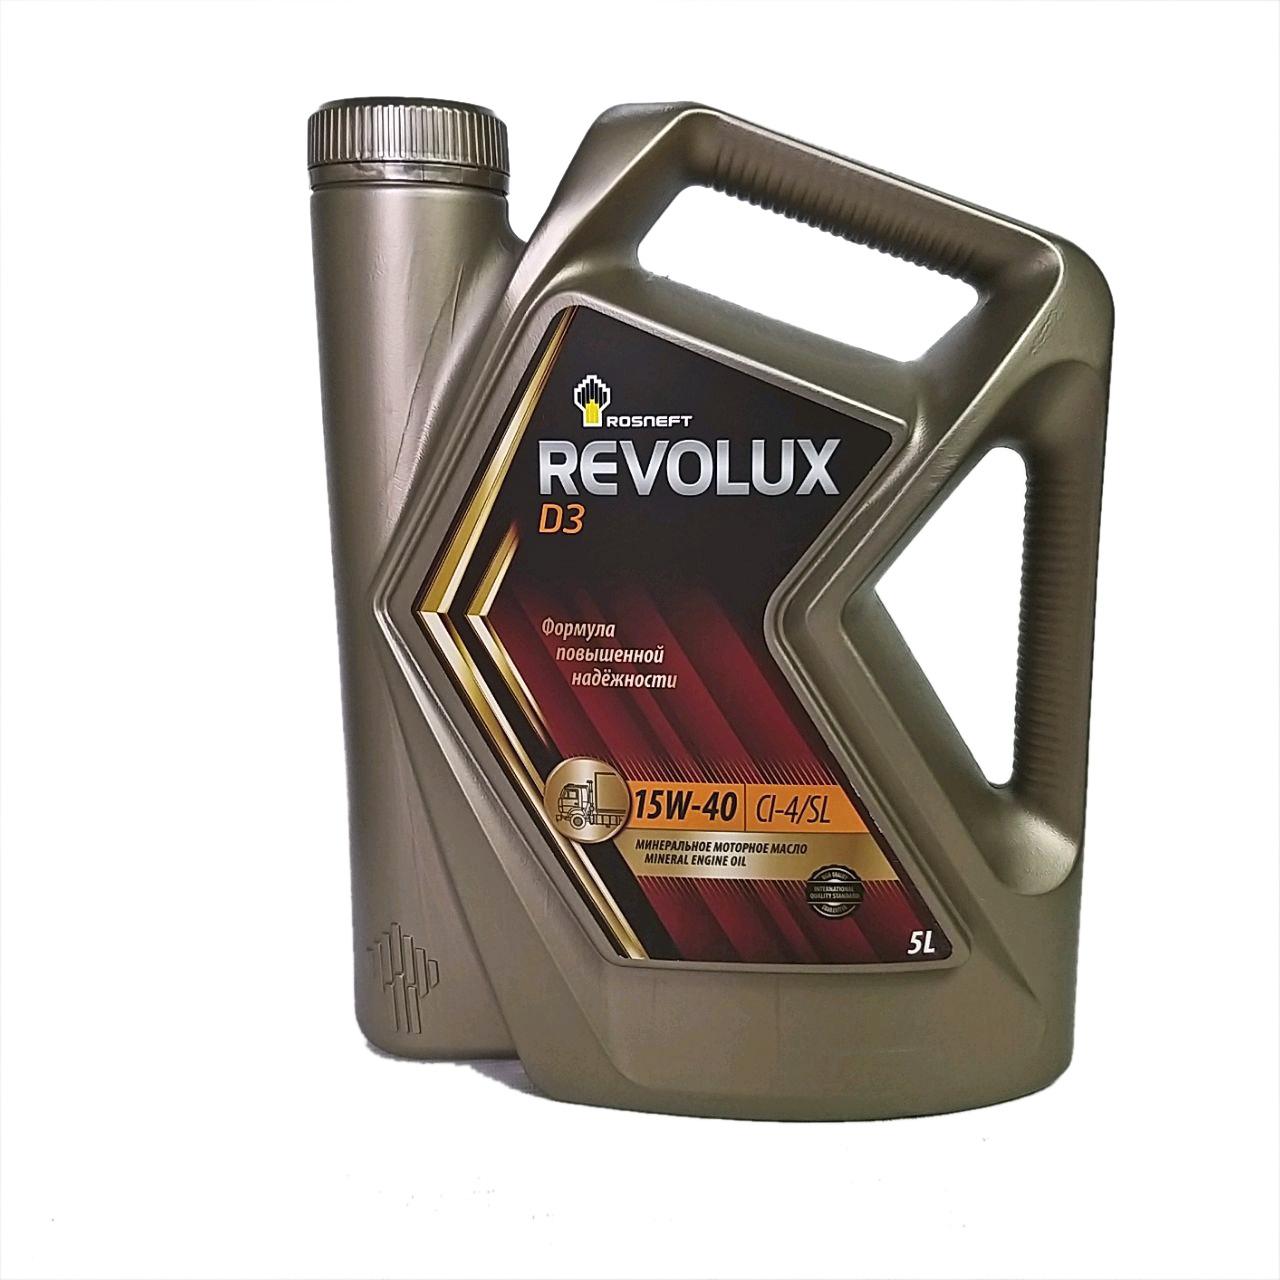 Rosneft Revolux D3 15w-40 (5 L.)